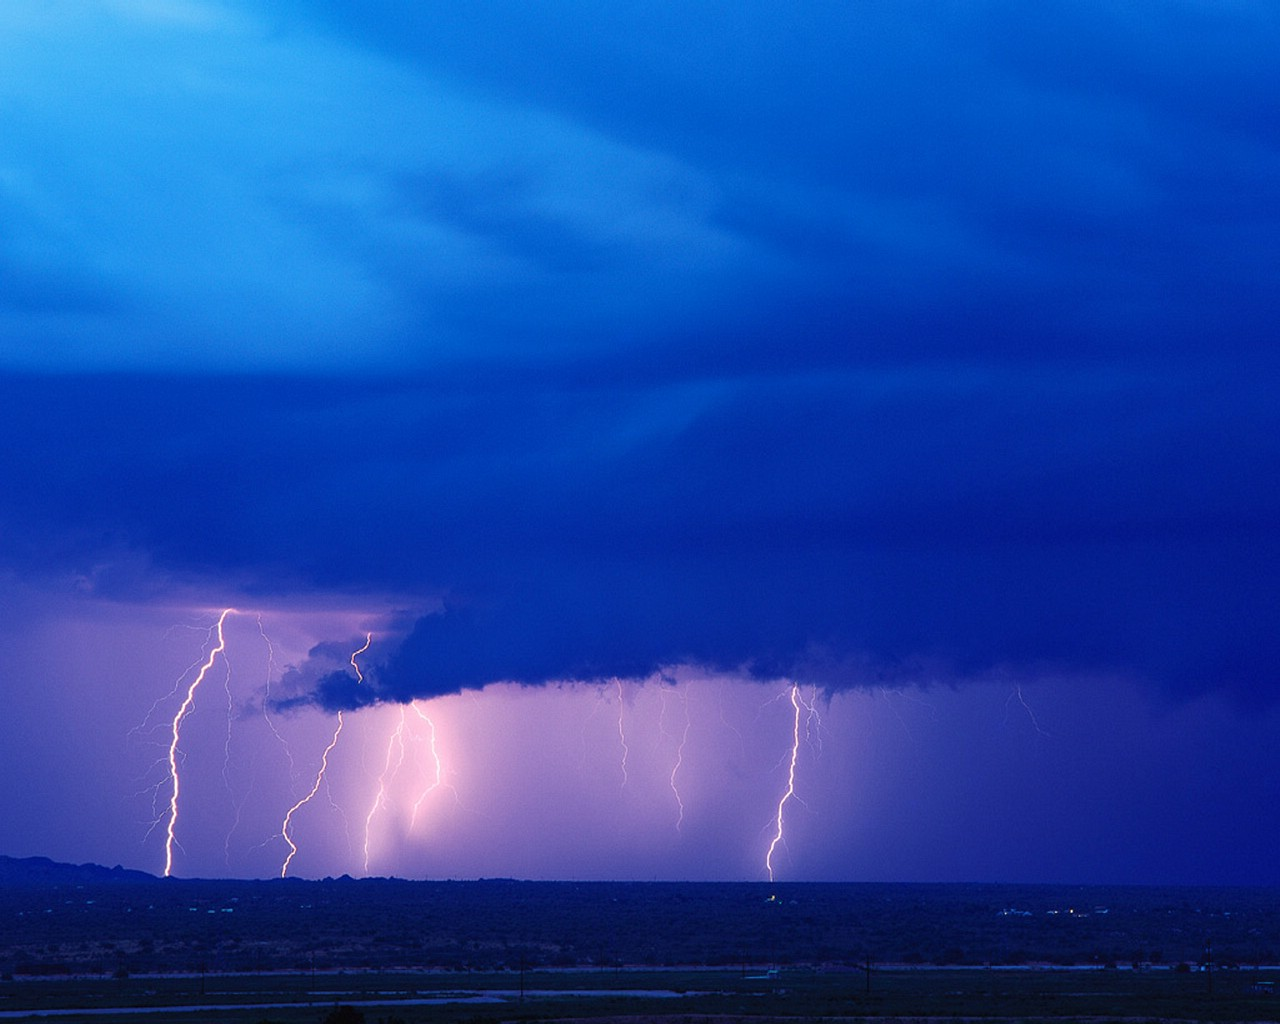 image Lightning strike in laundry